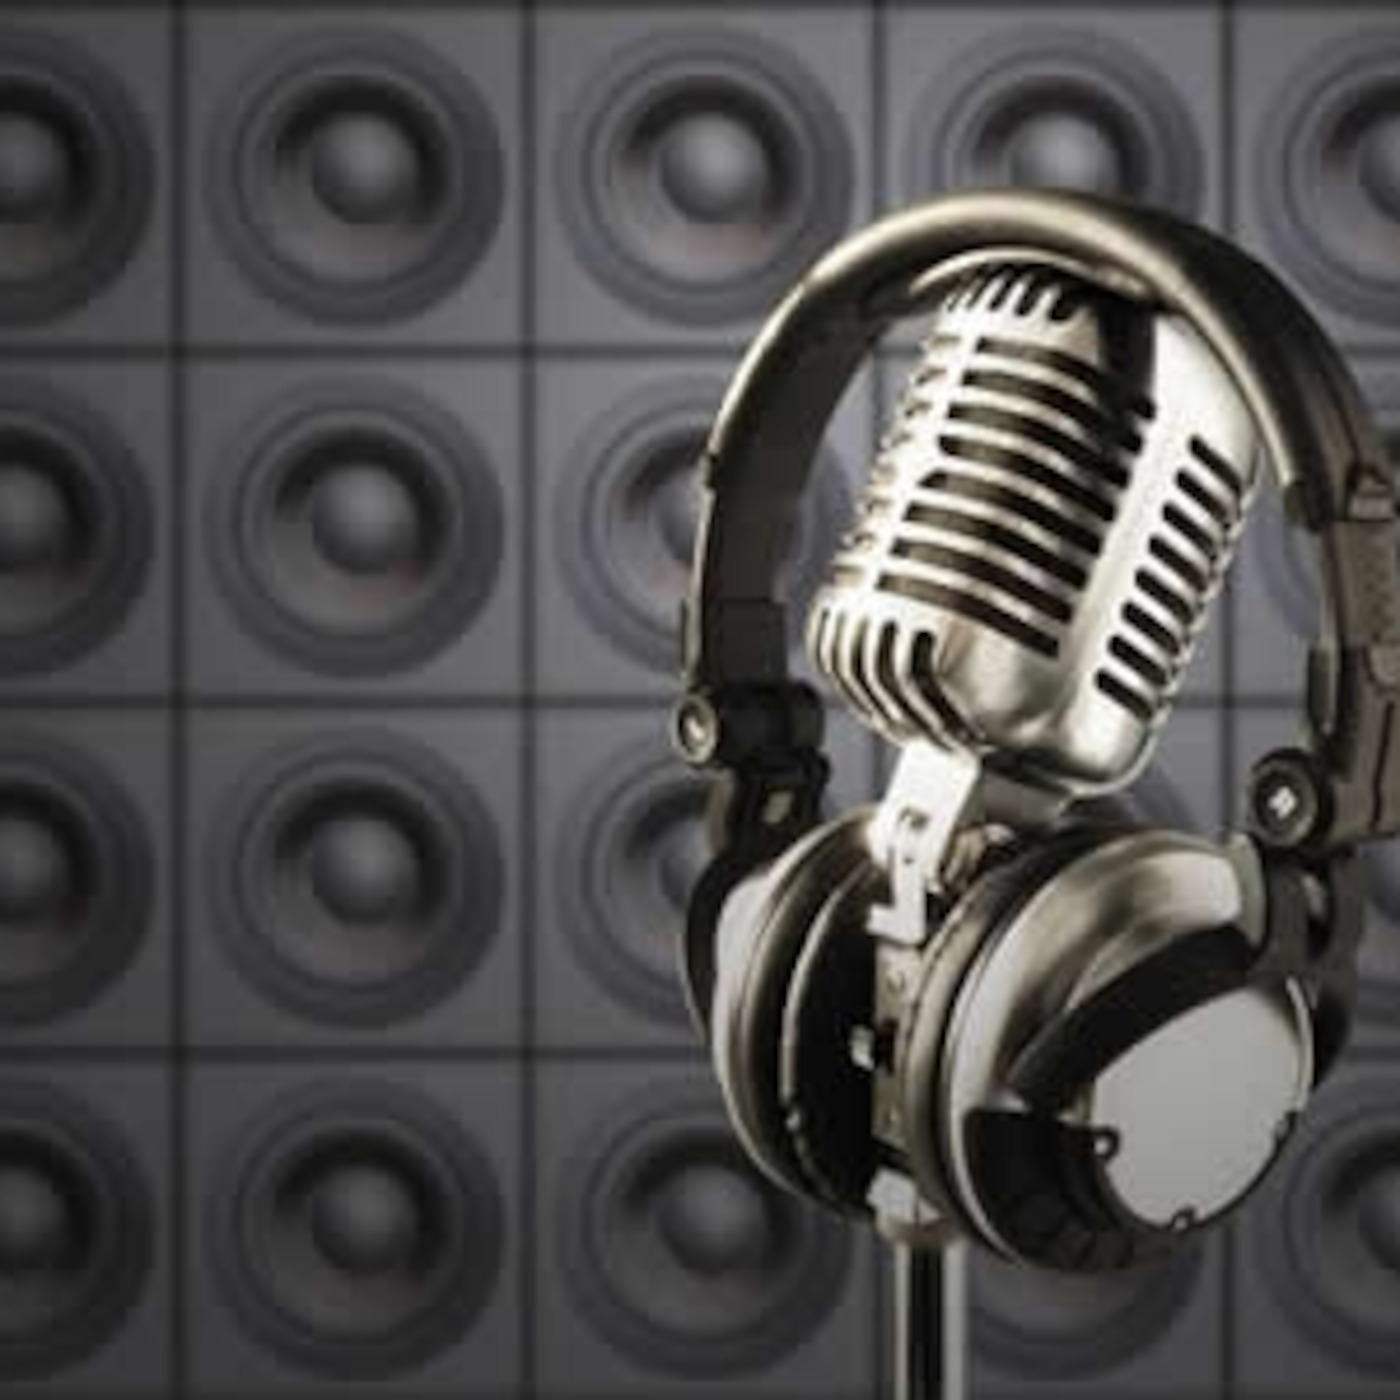 Звуки для озвучки конкурсов